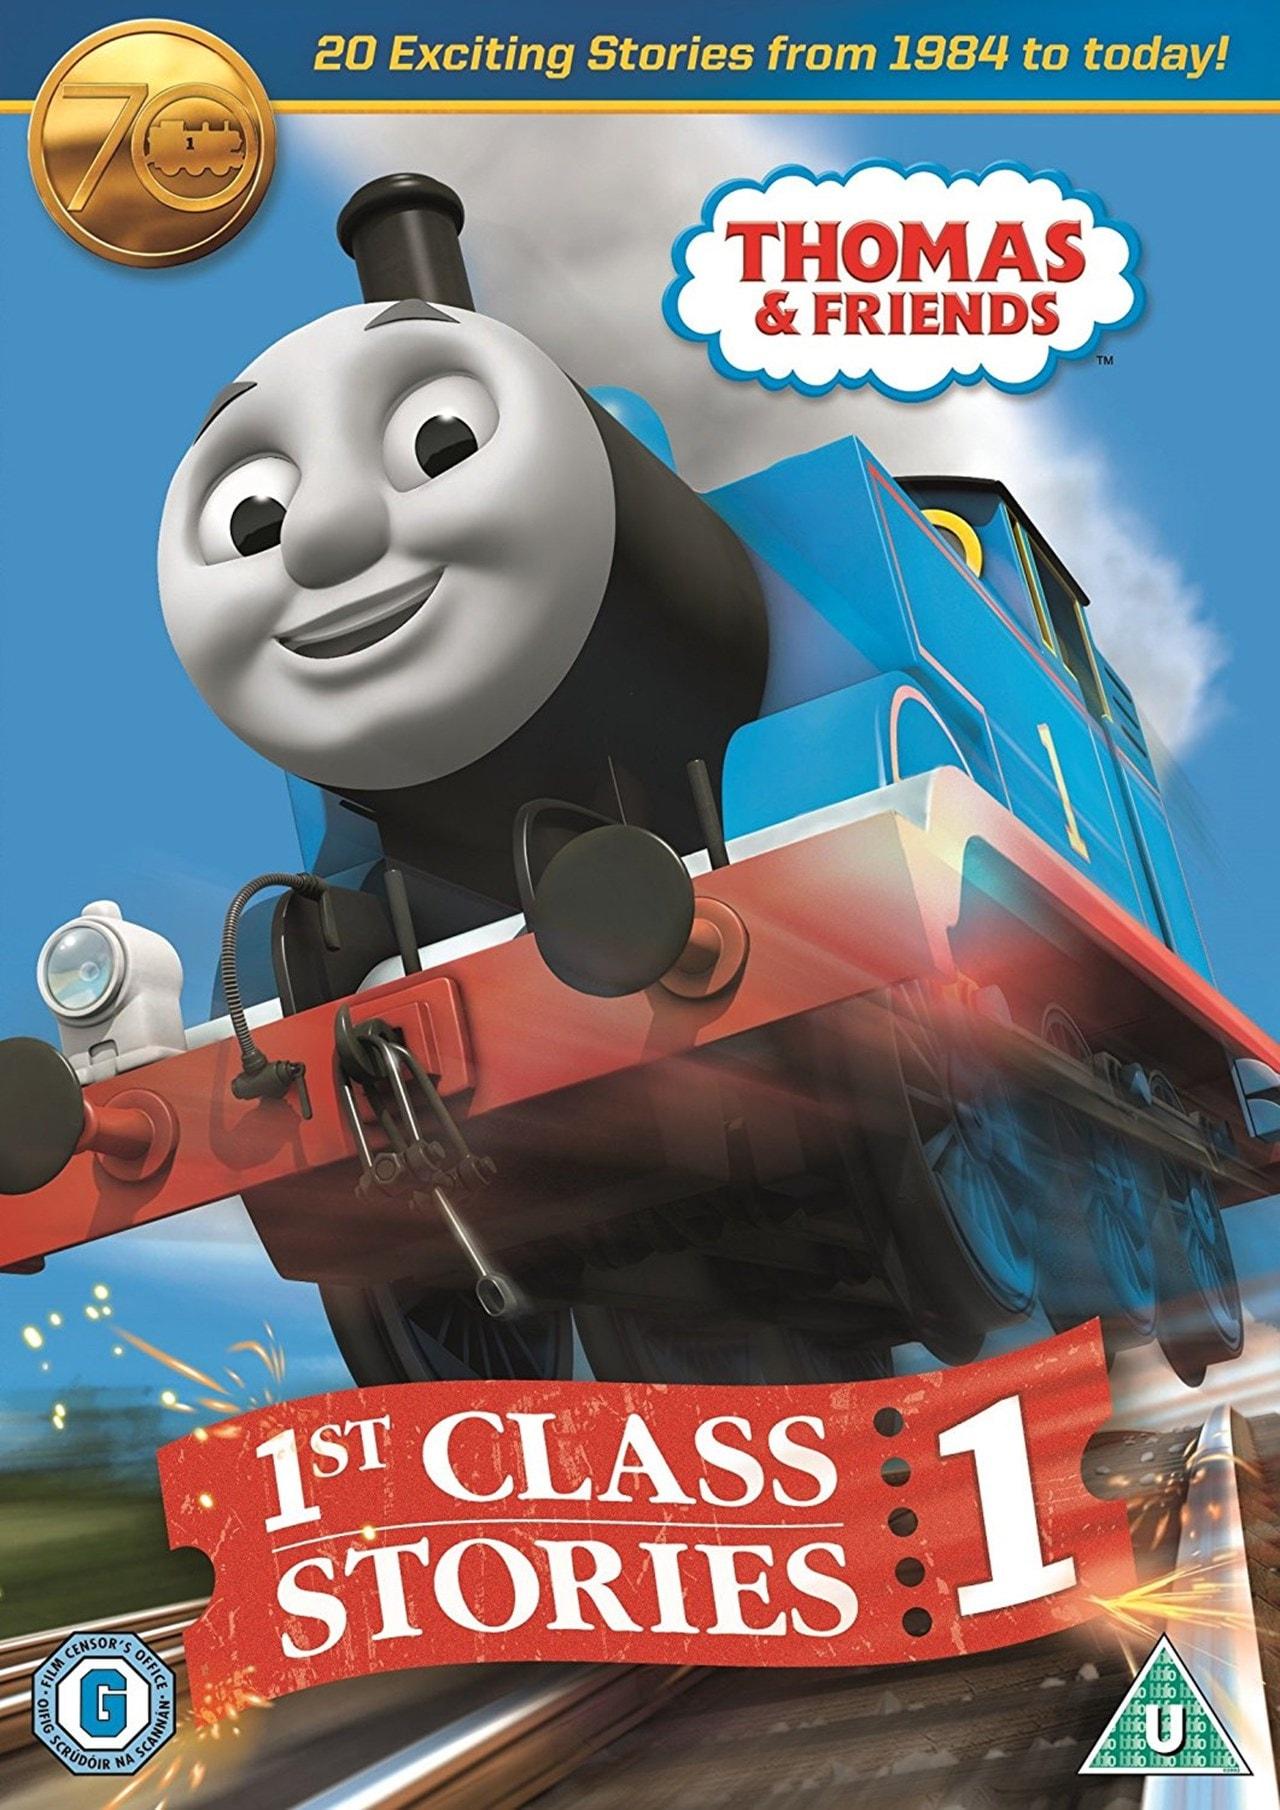 Thomas & Friends: 1st Class Stories - 1